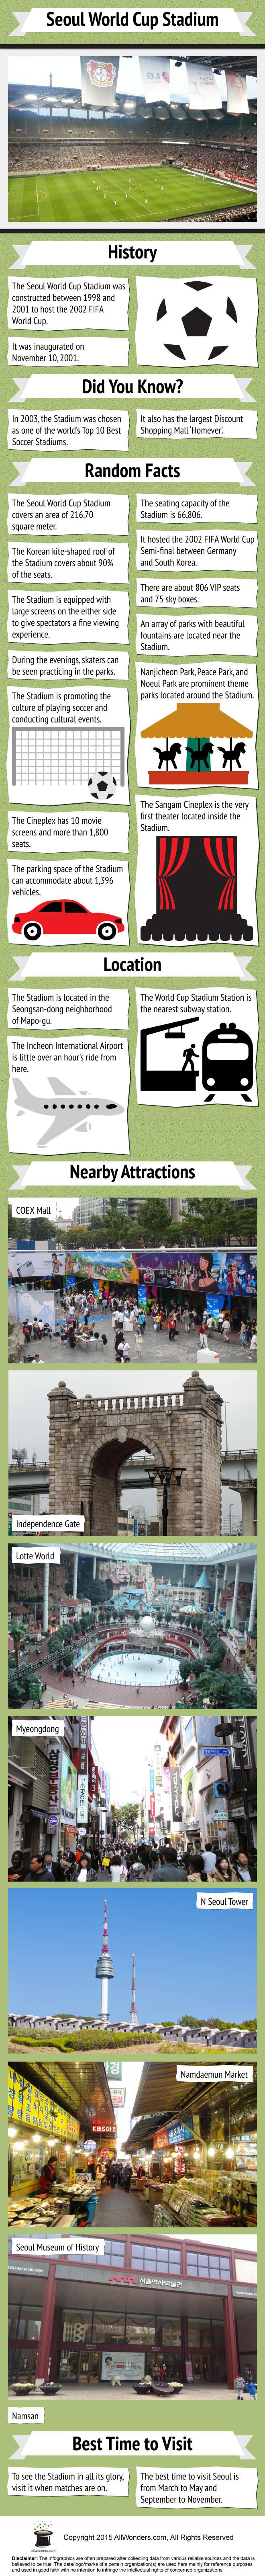 Seoul World Cup Stadium Infographic